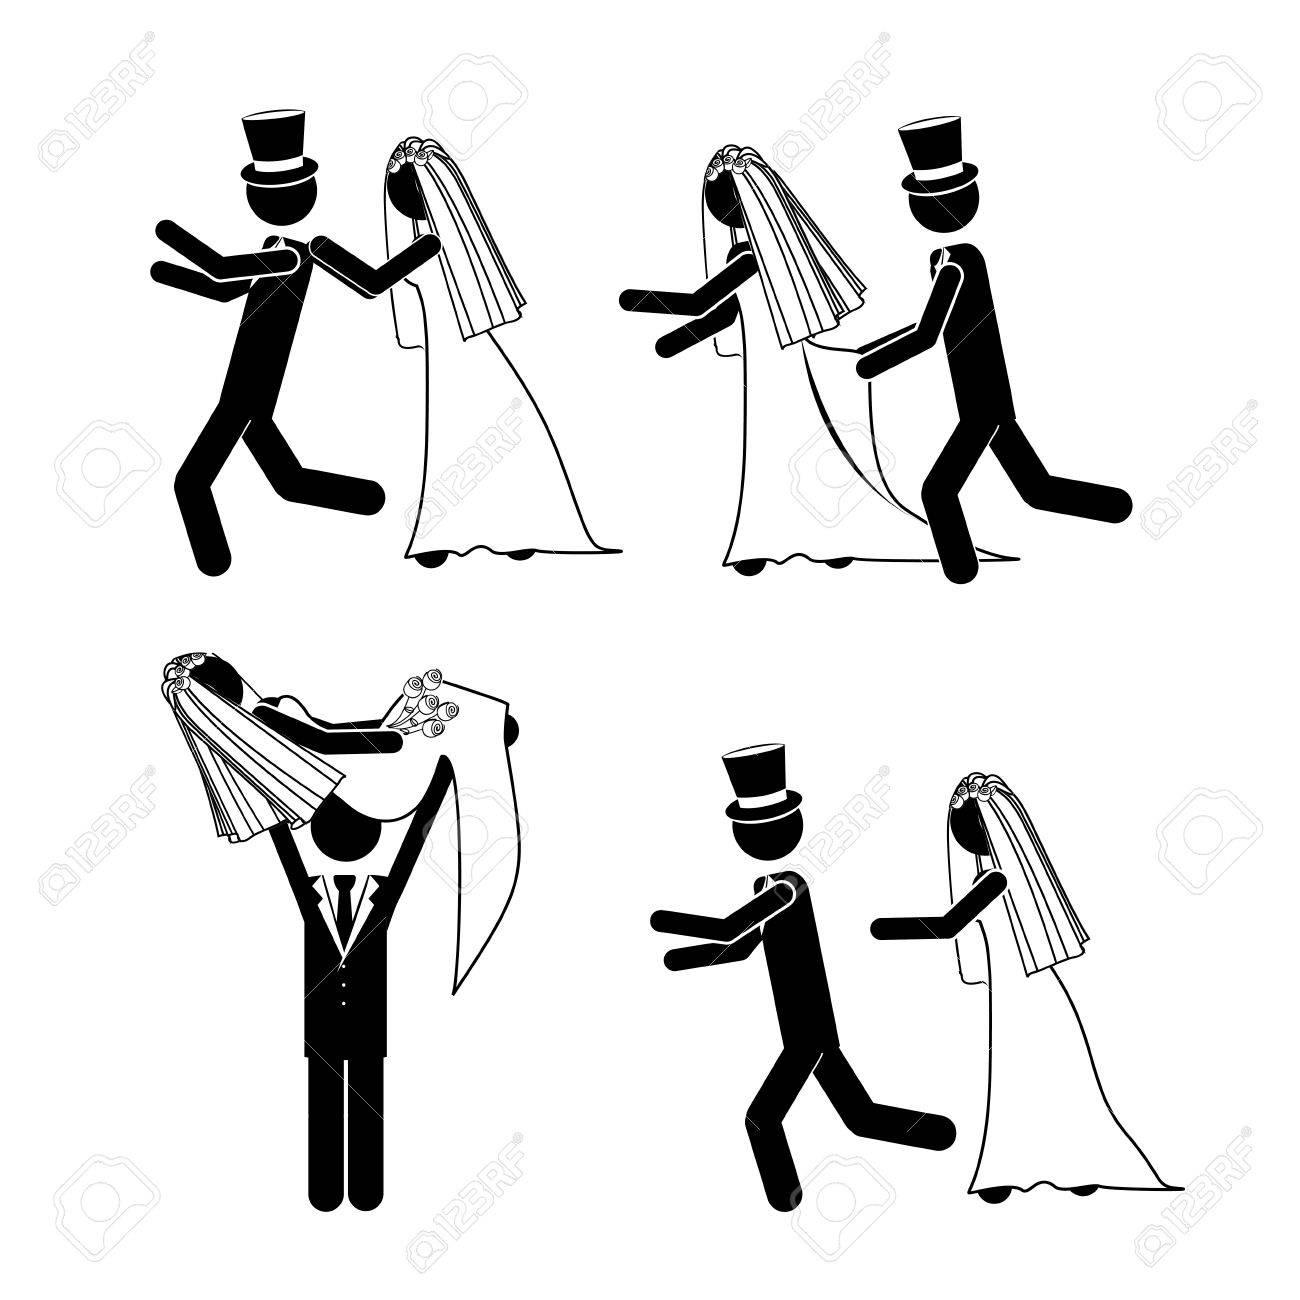 wedding design over white background vector illustration Stock Vector - 21522160